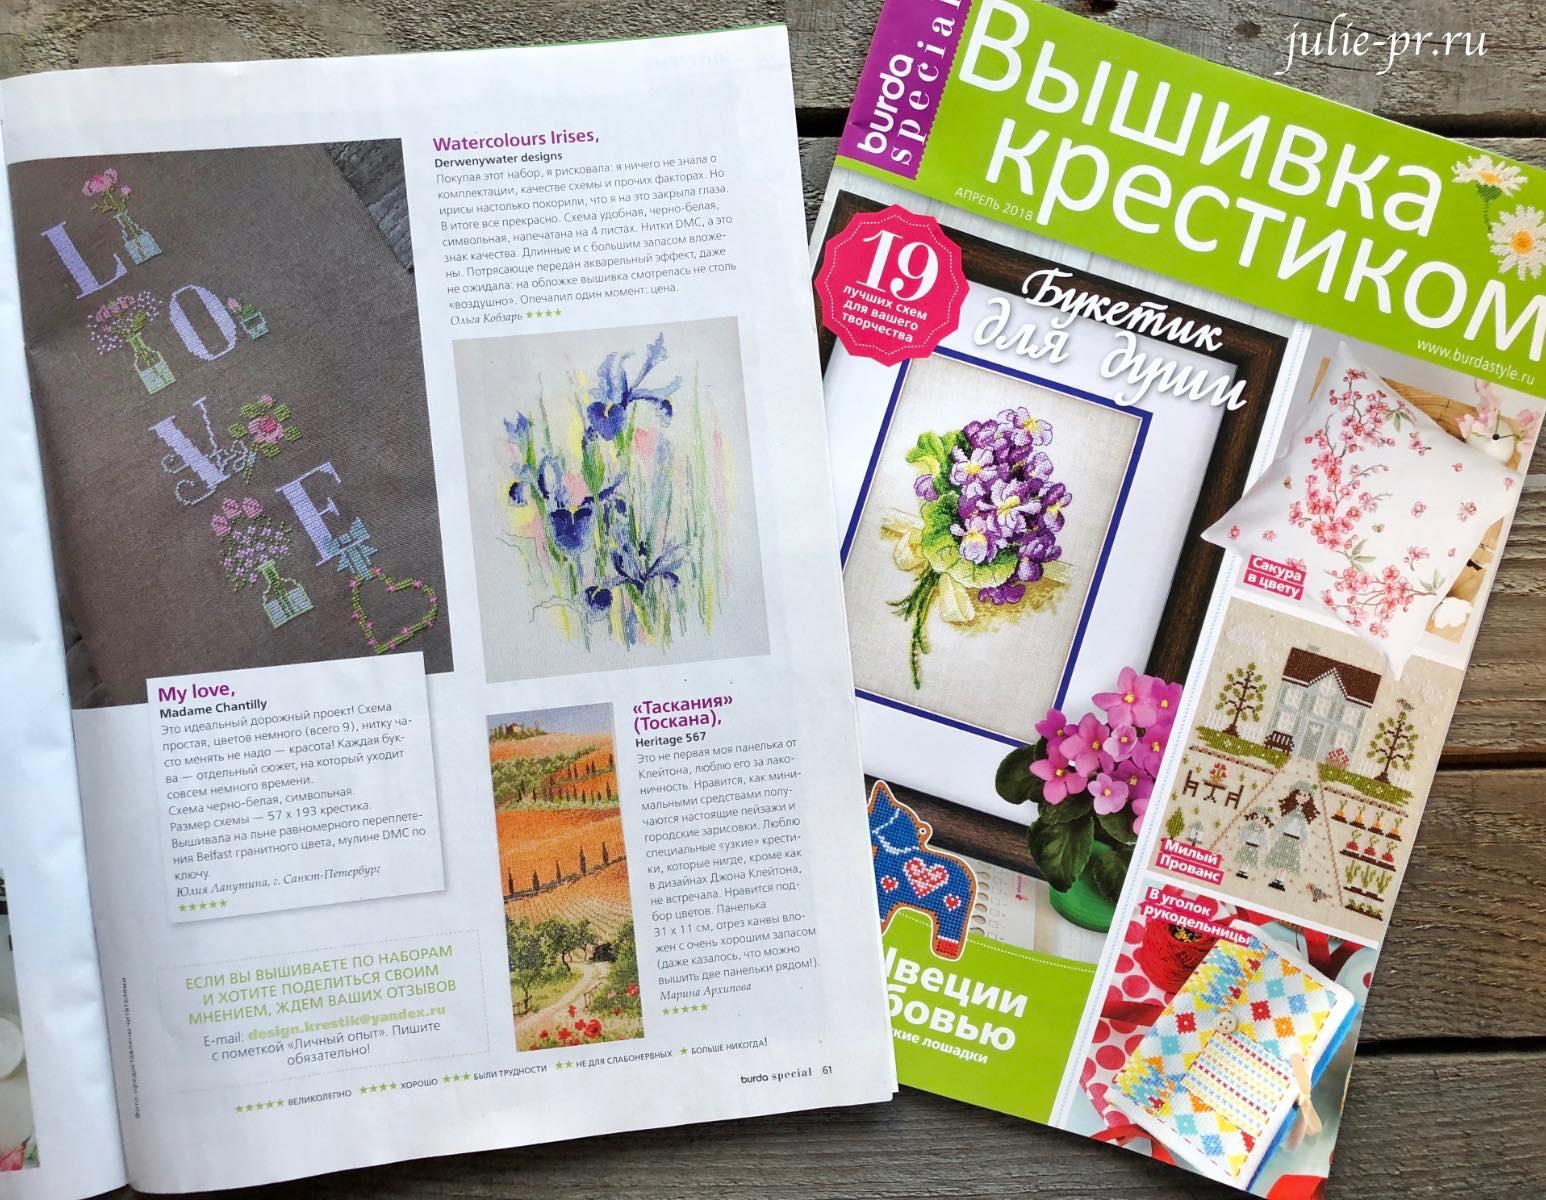 Журнал Burda. Вышивка крестиком апрель 2018, вышивка крестом, Юлия Лапутина